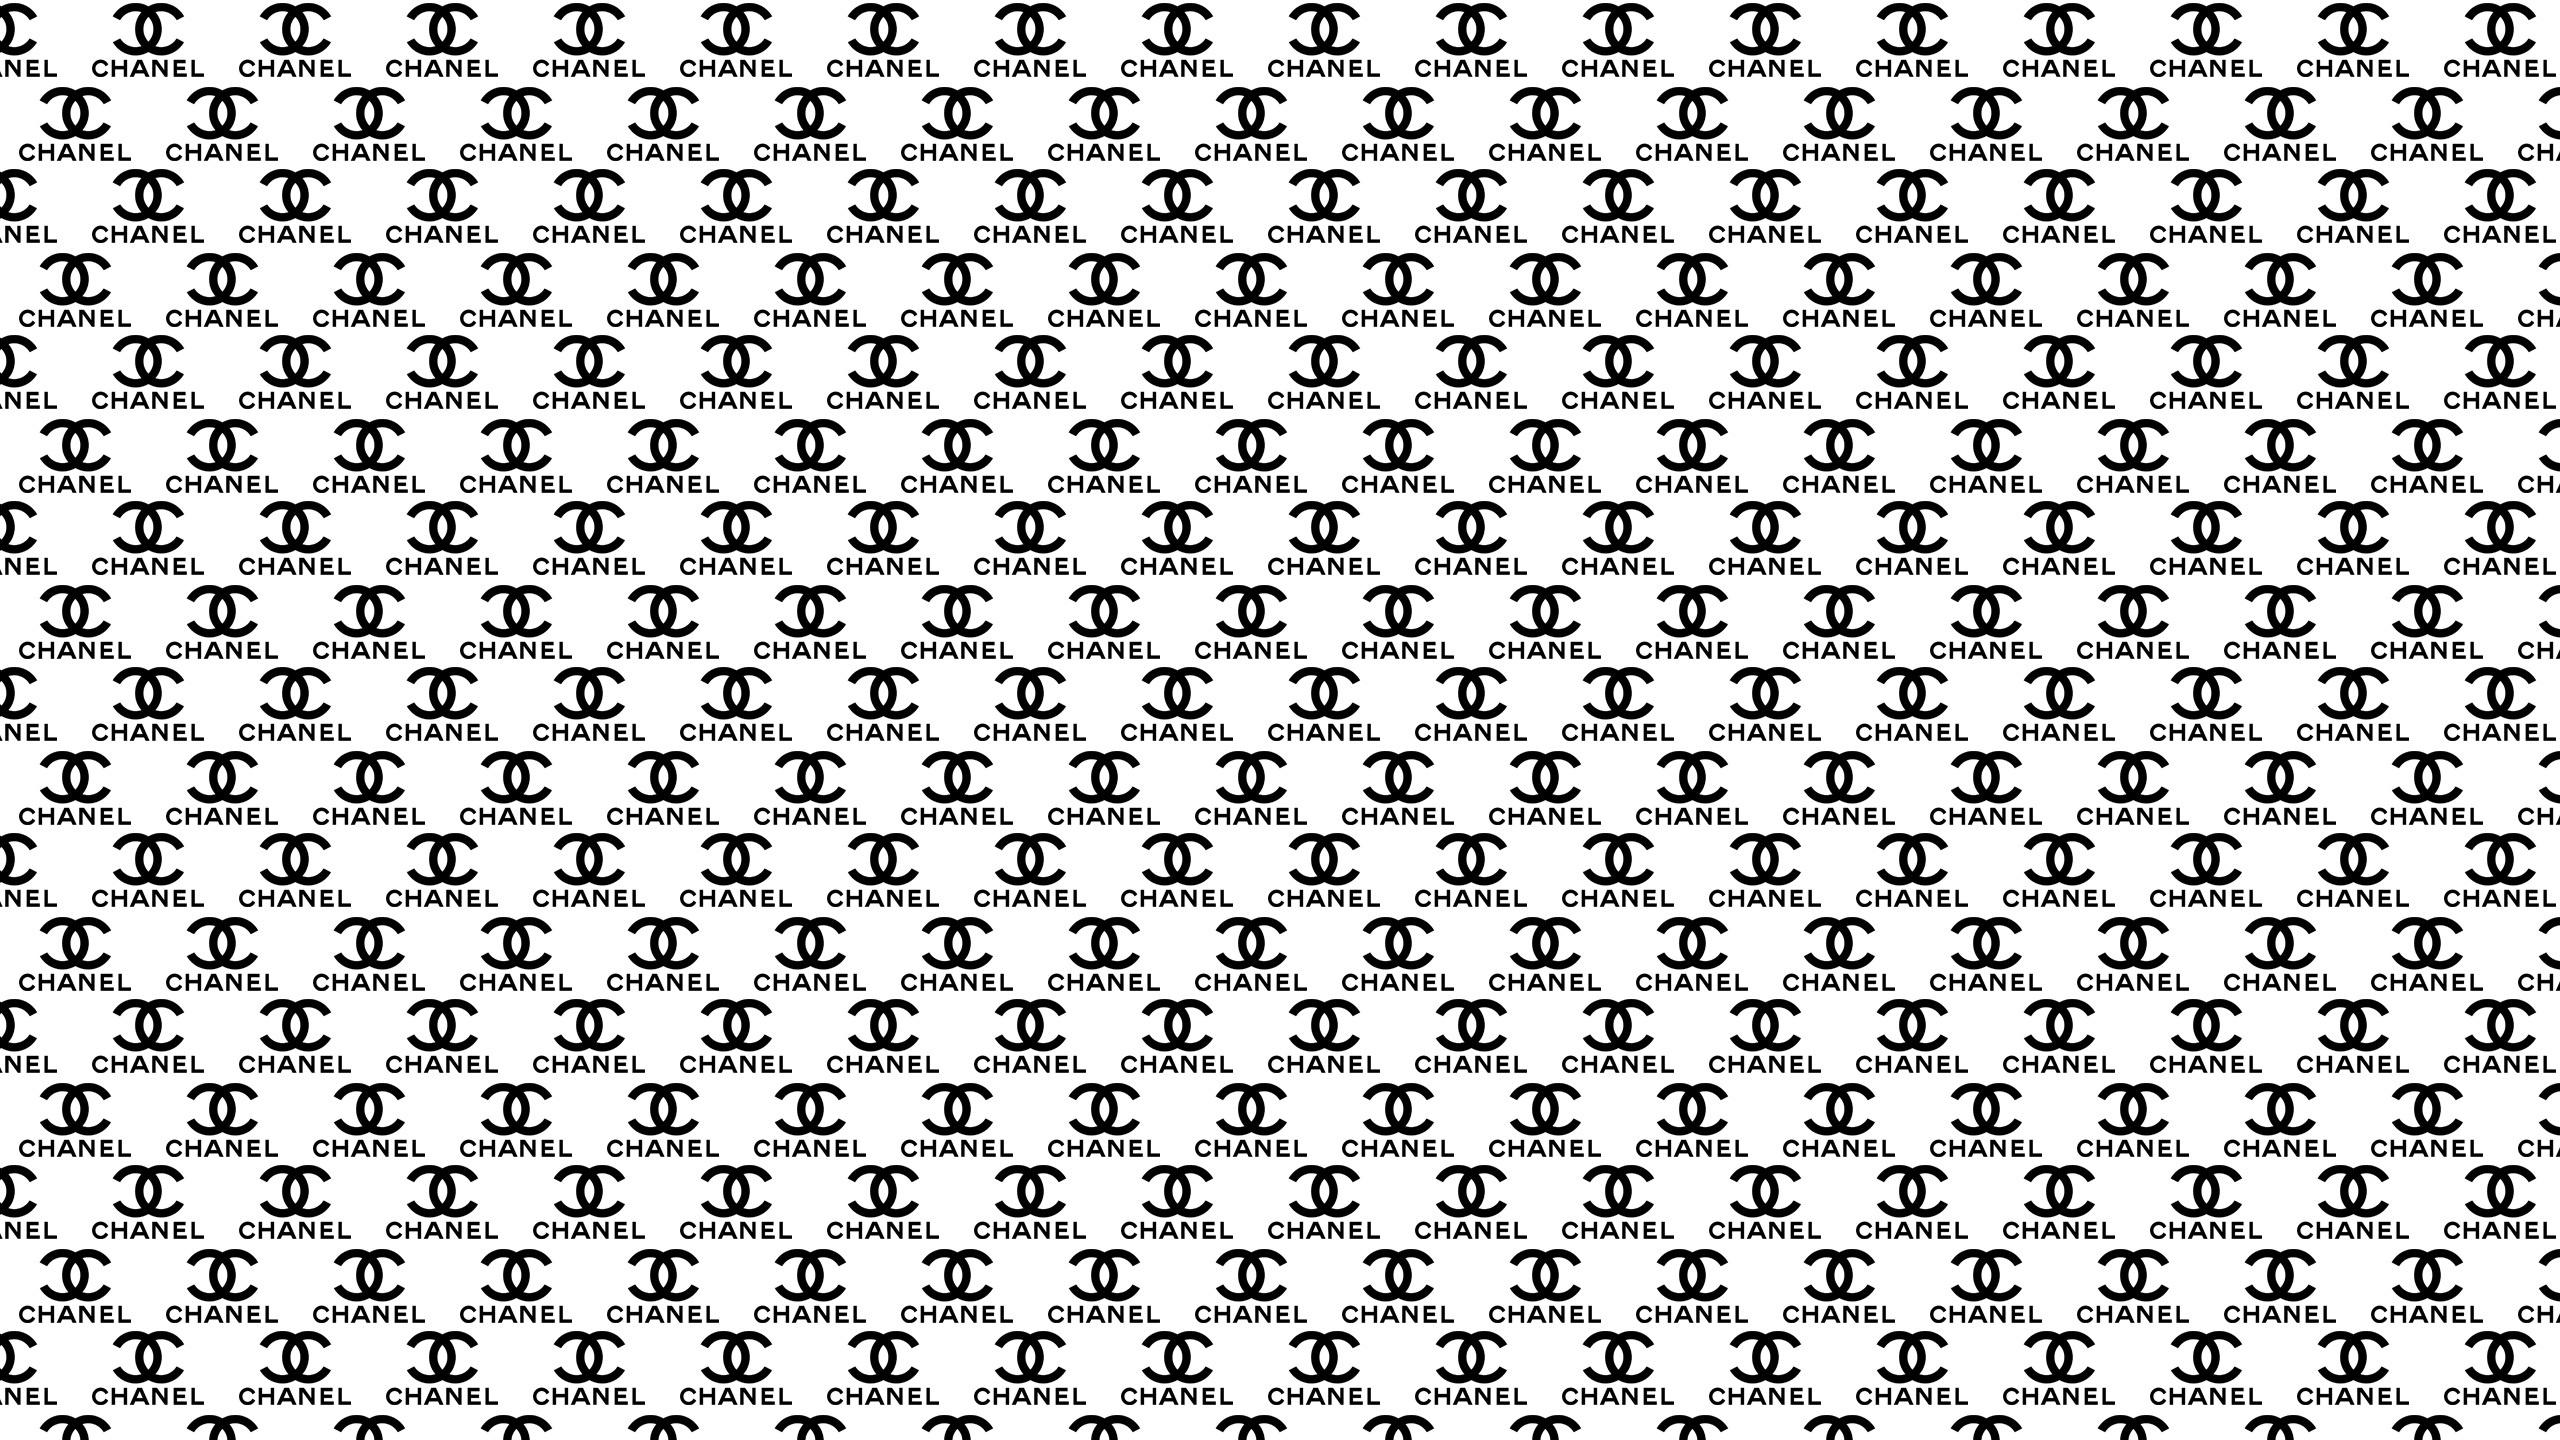 chanel logo pattern wallpaper background 54426